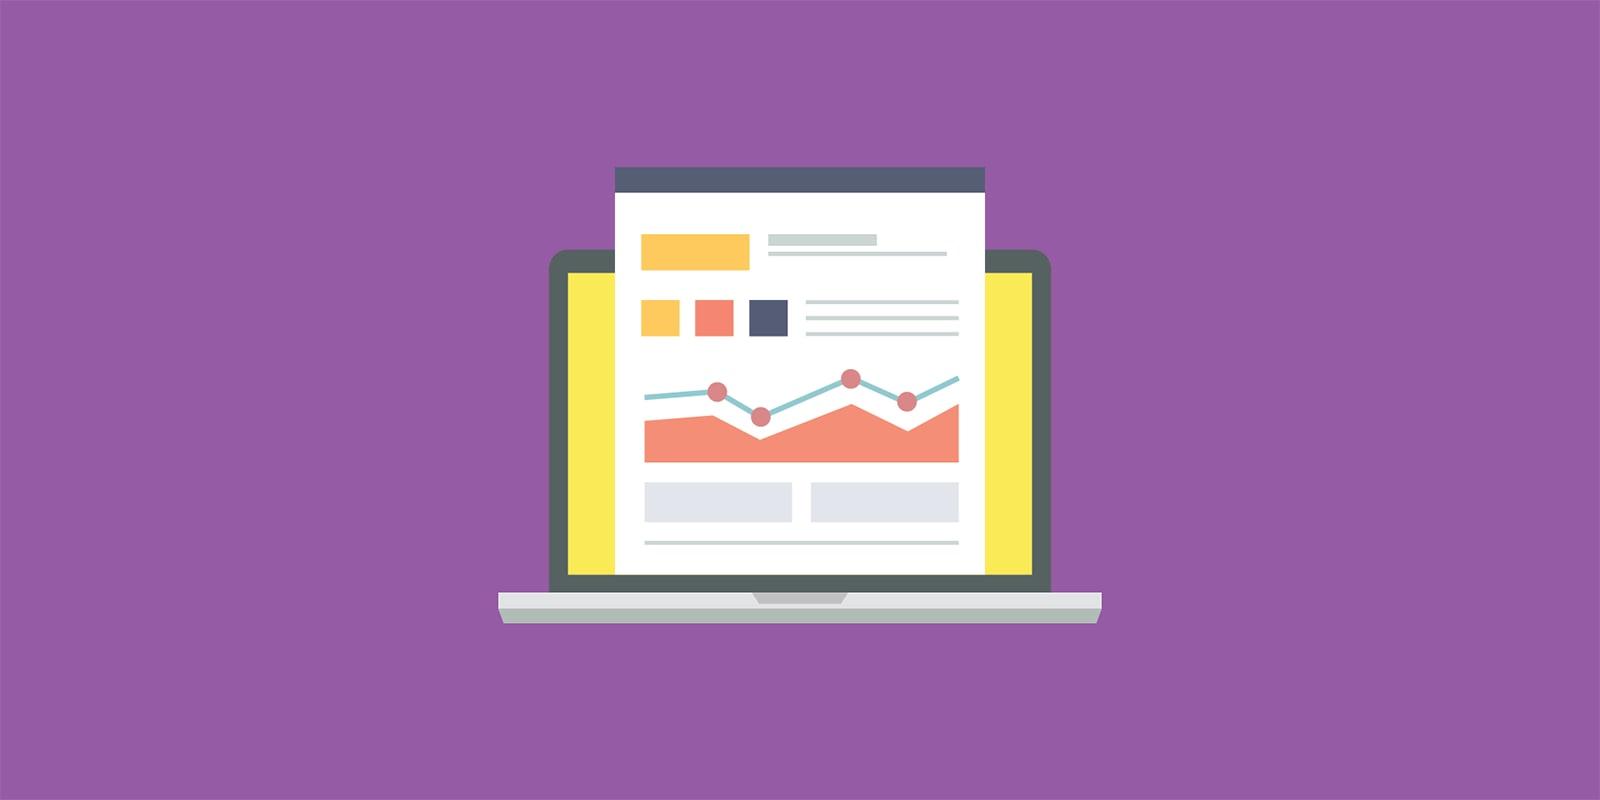 Social media marketing measuring analytics graphic